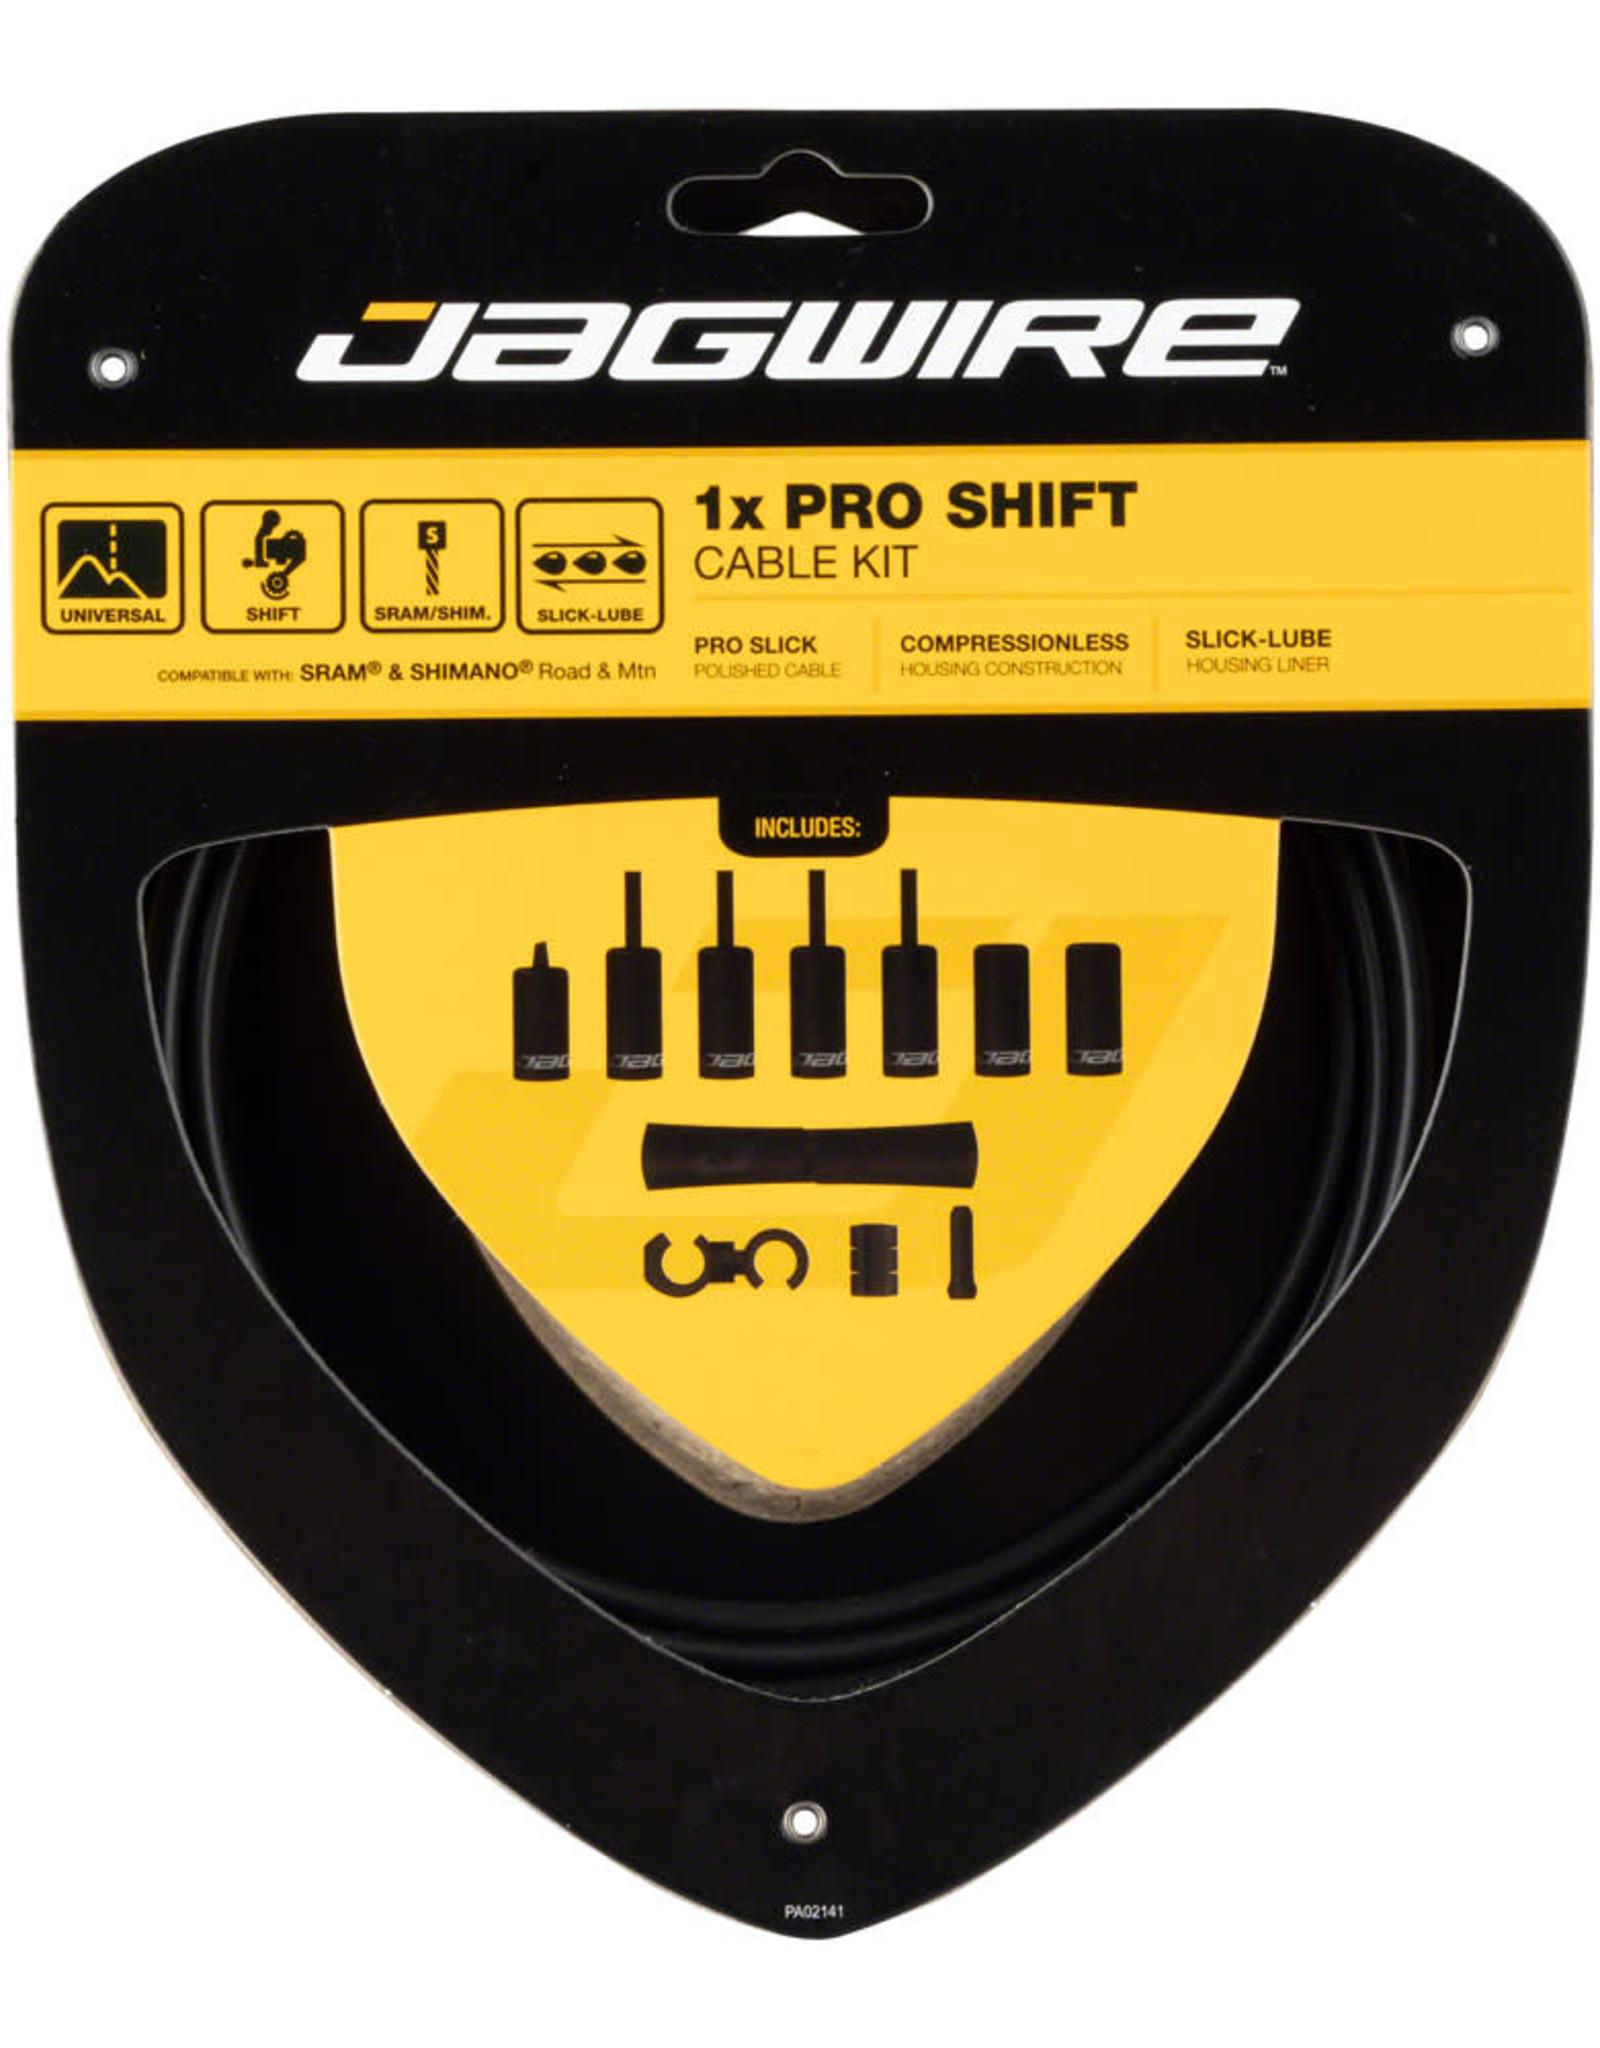 Jagwire Jagwire 1x Pro Shift Kit Road/Mountain SRAM/Shimano, Stealth Black